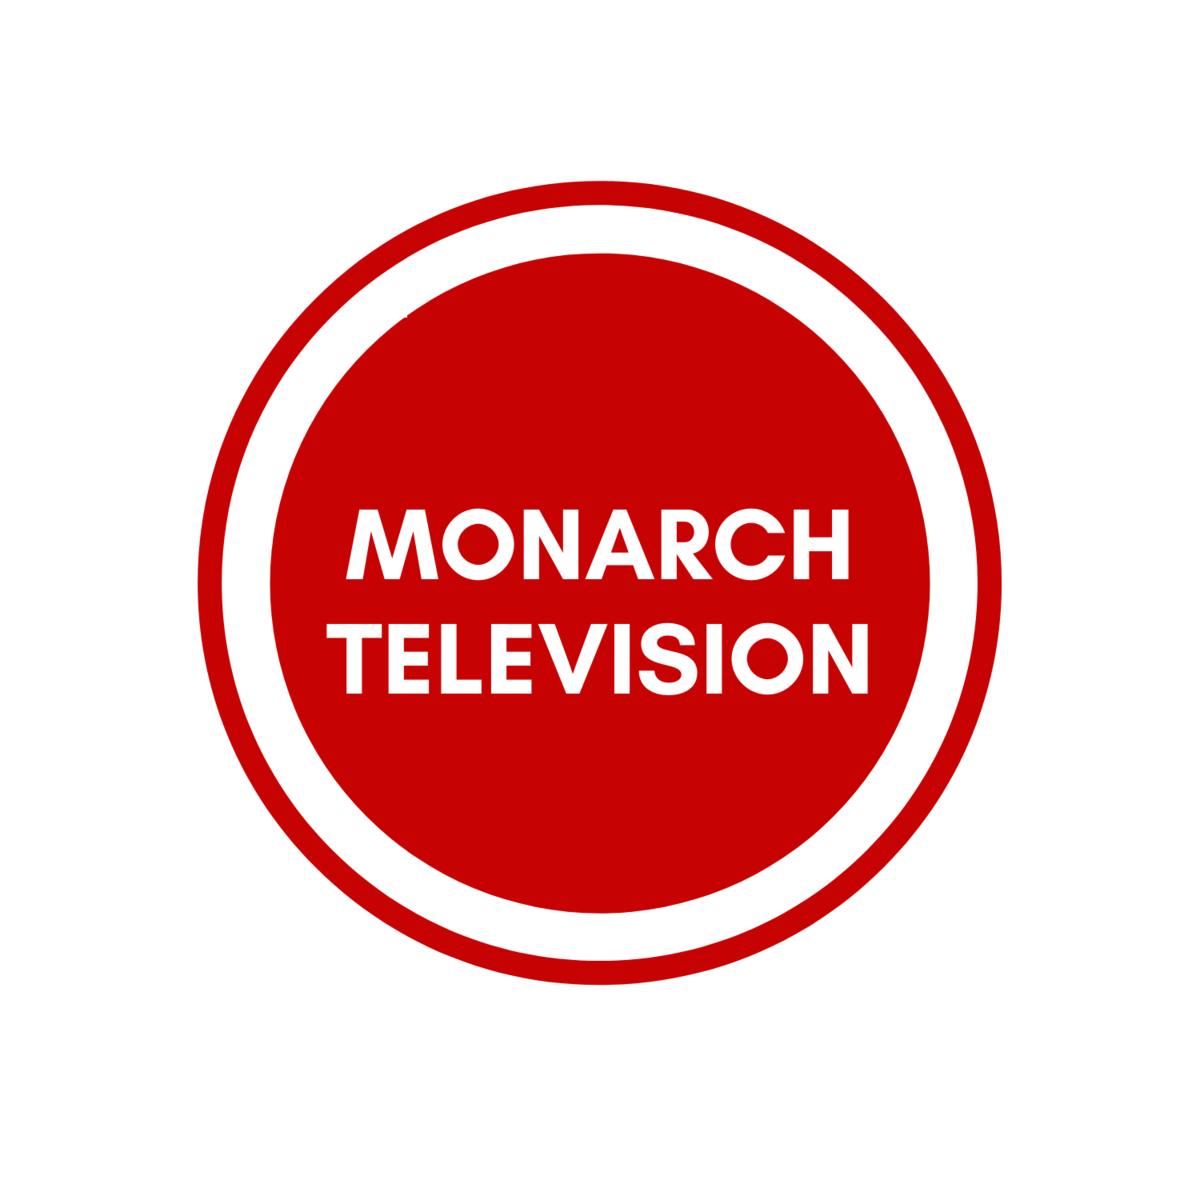 Monarch Television